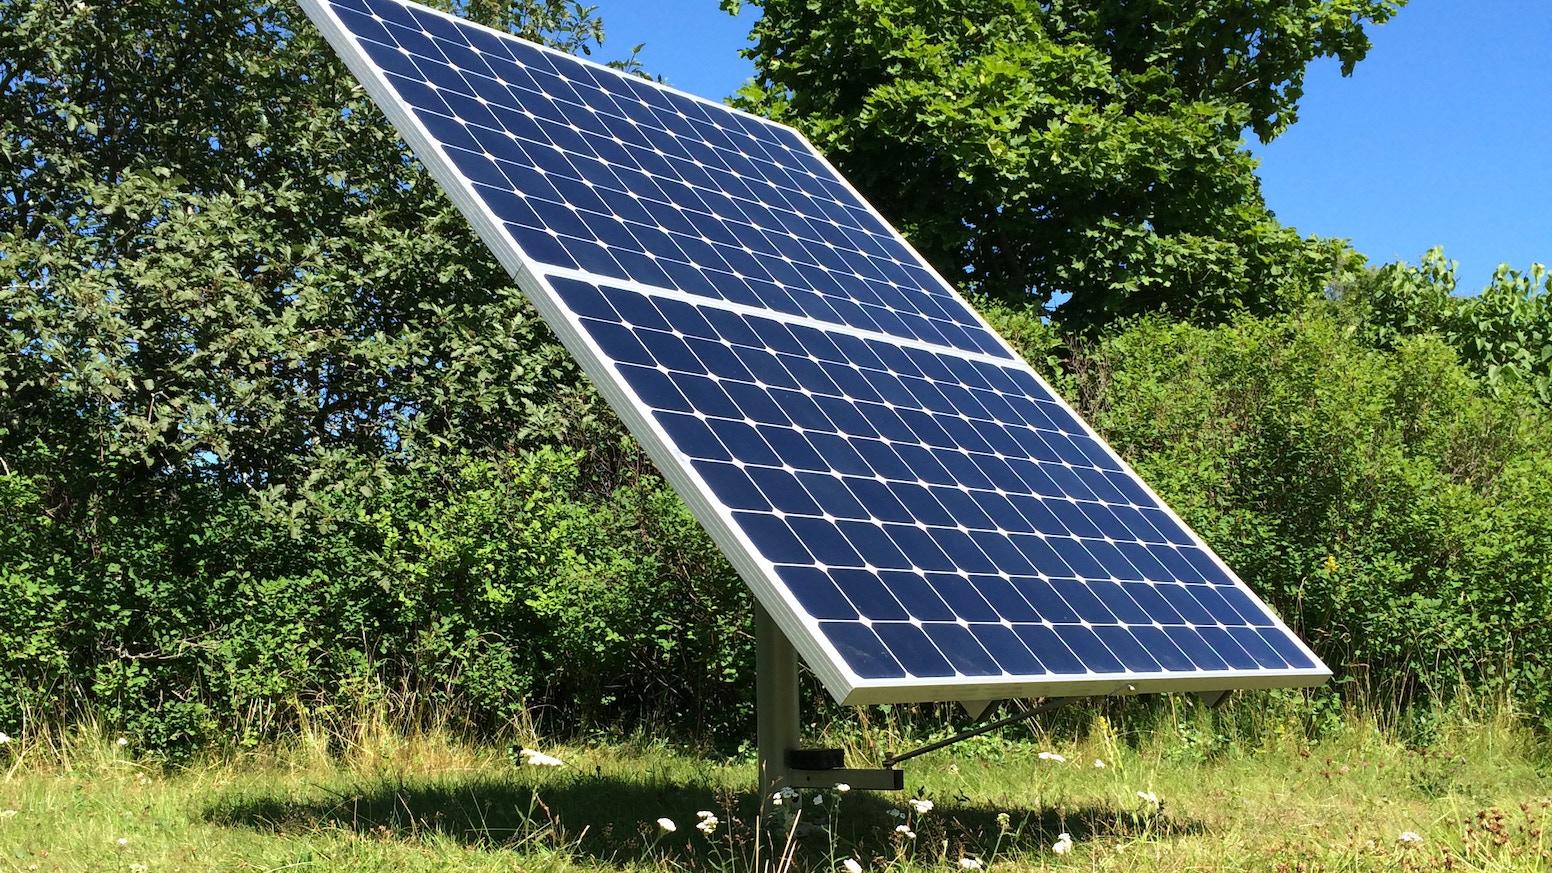 Heliomotion Home Solar Power Plant by HelioZenit — Kickstarter